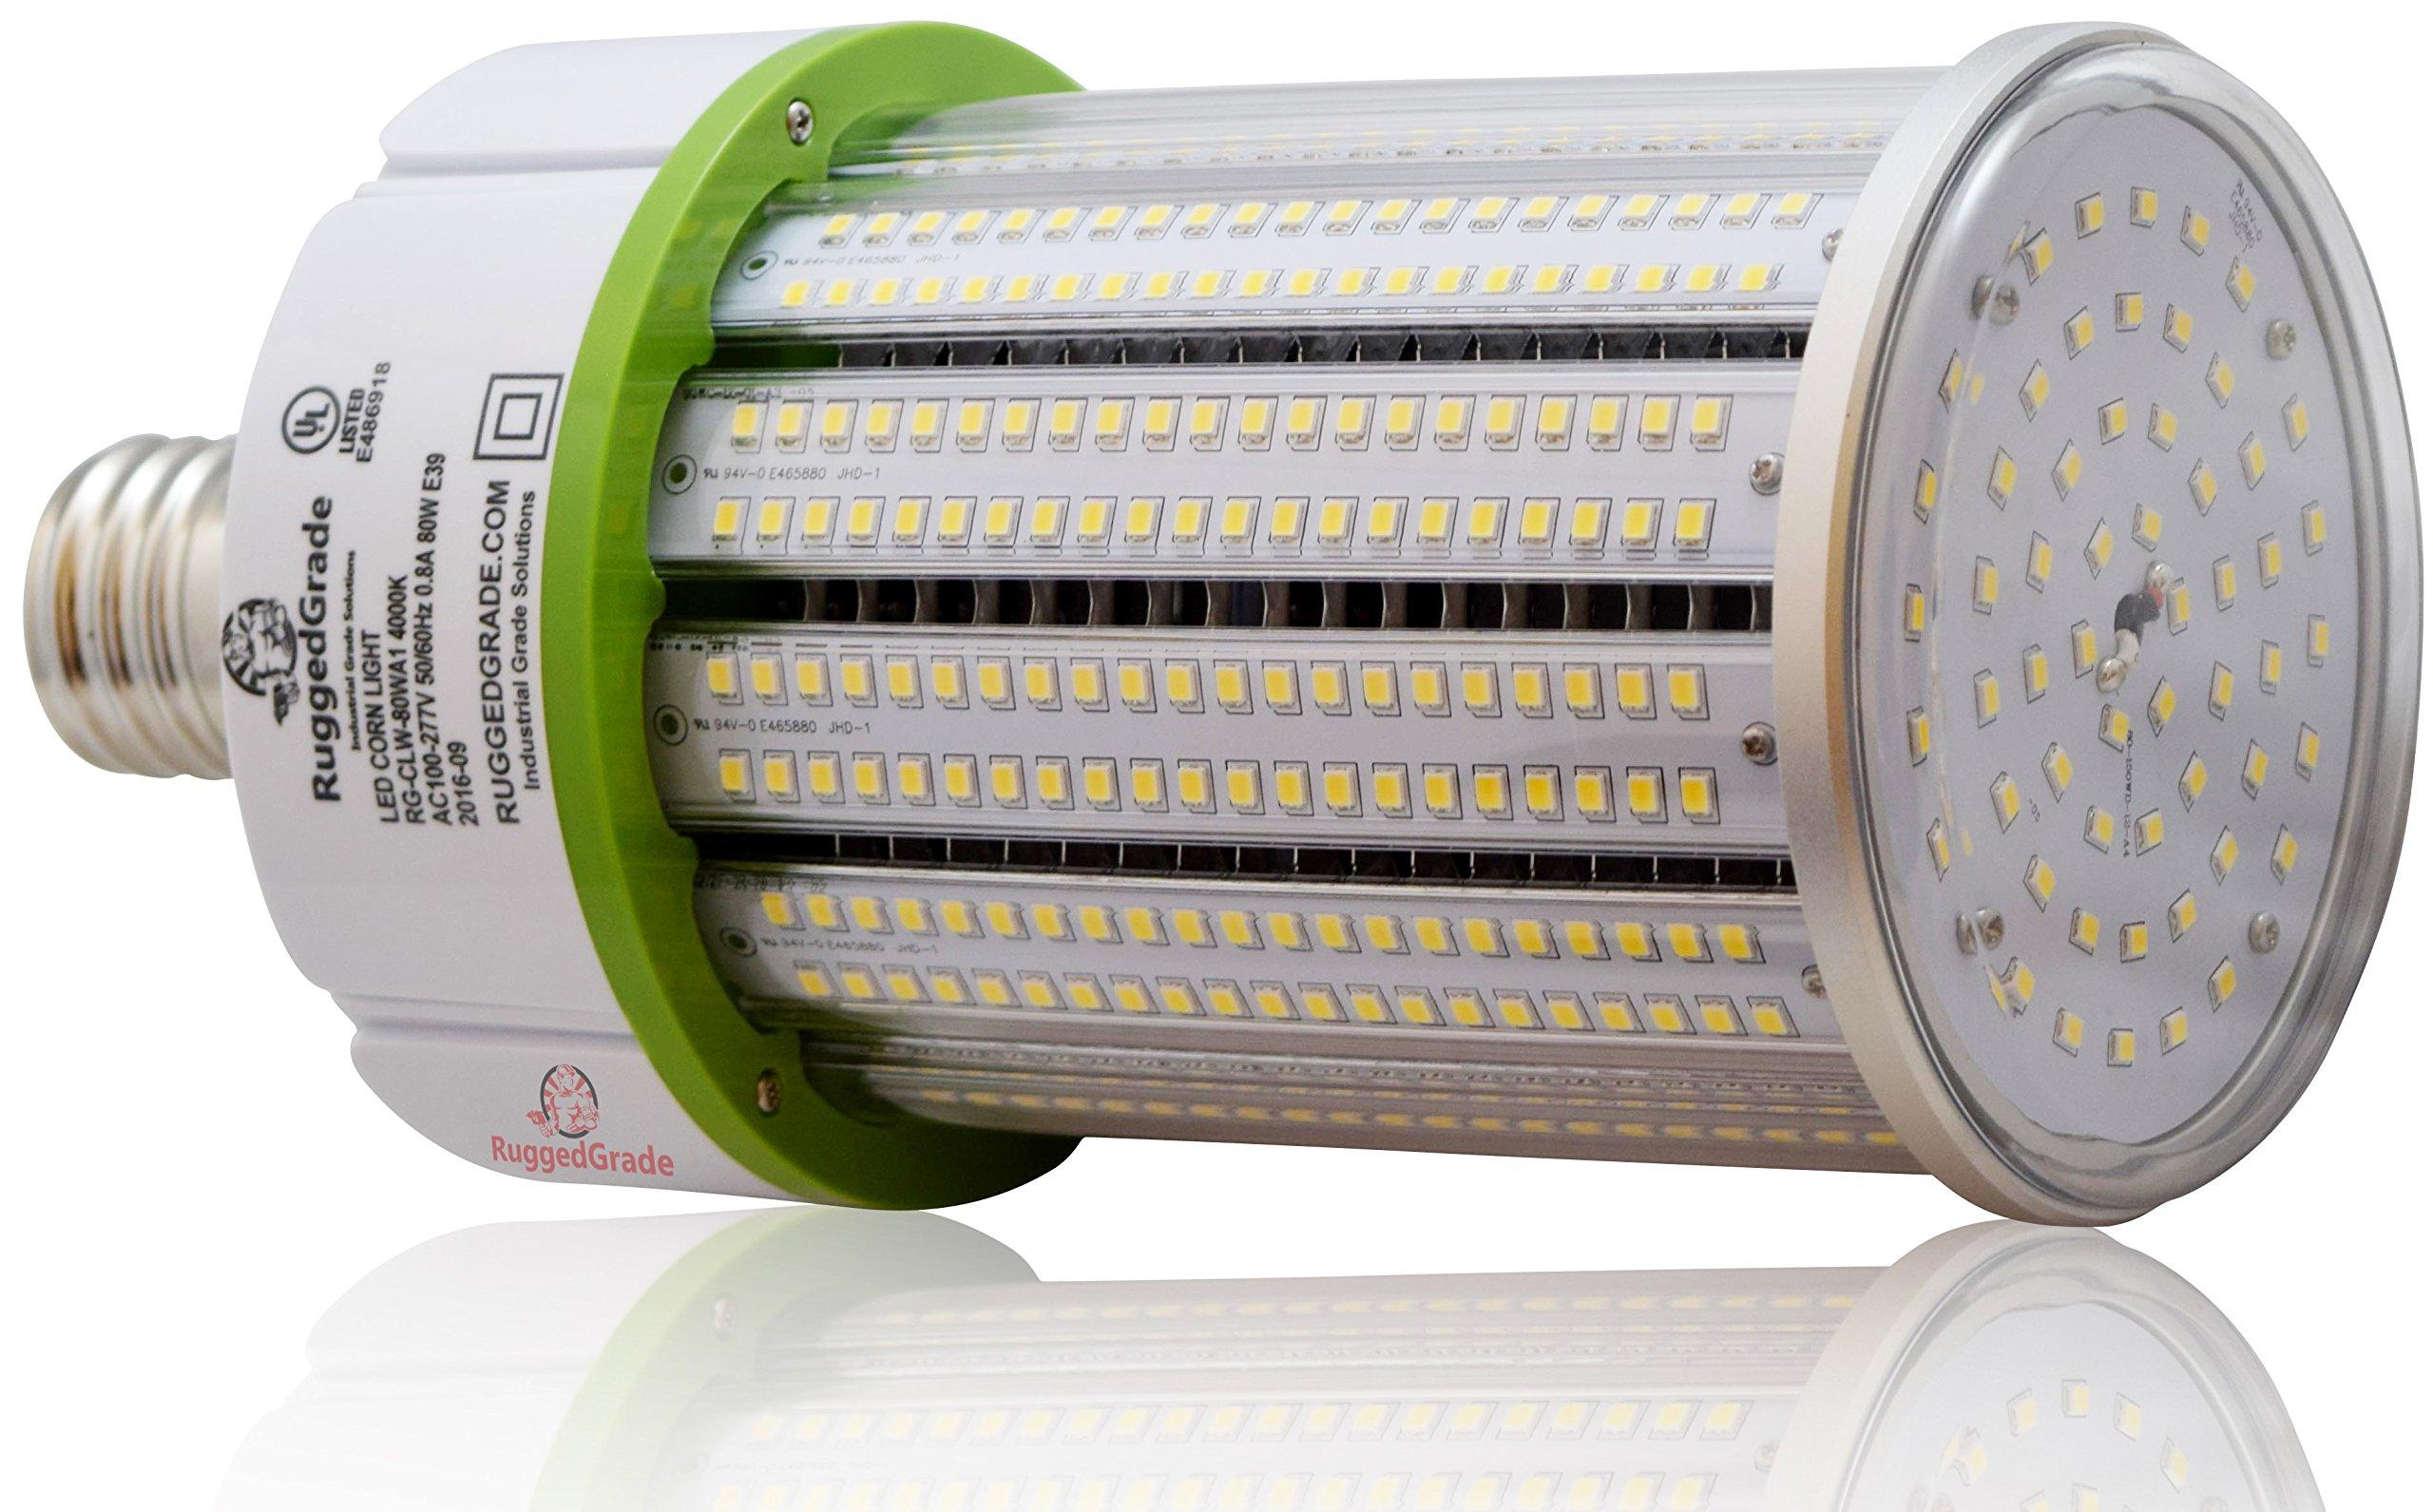 80 Watt E39 LED Bulb - 11,276 Lumens - 5000K -Replacement for Fixtures HID/HPS/Metal Halide or CFL - High Efficiency 125 Lumen/watt - 360 Degree Lighting - LED Corn Light Bulb